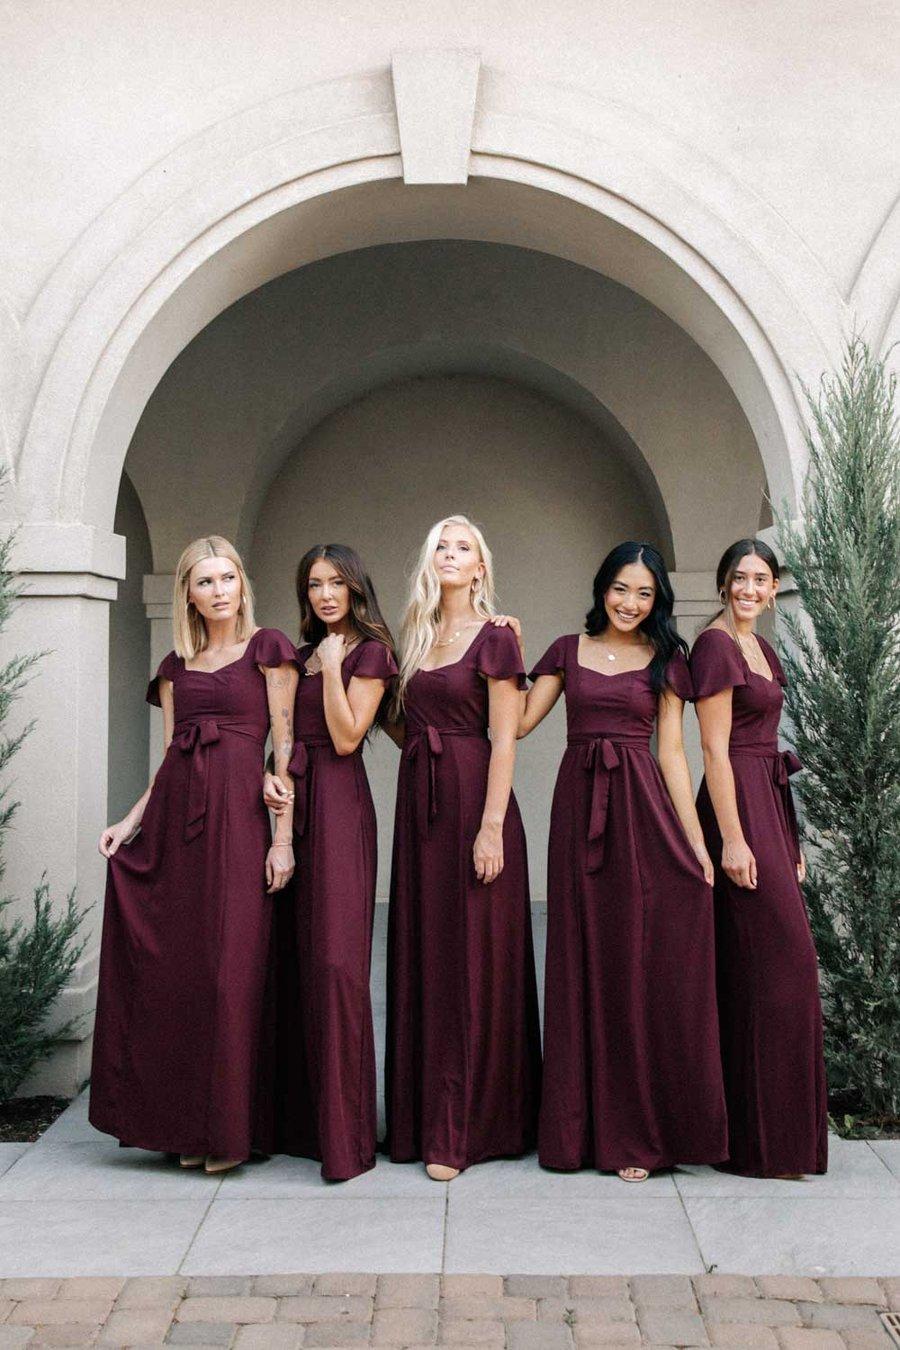 bridesmaid dresses, bridesmaid dress ideas, bridesmaid dress colors, bridesmaid dress styles, affordable bridesmaid dress, plum bridesmaid dresses